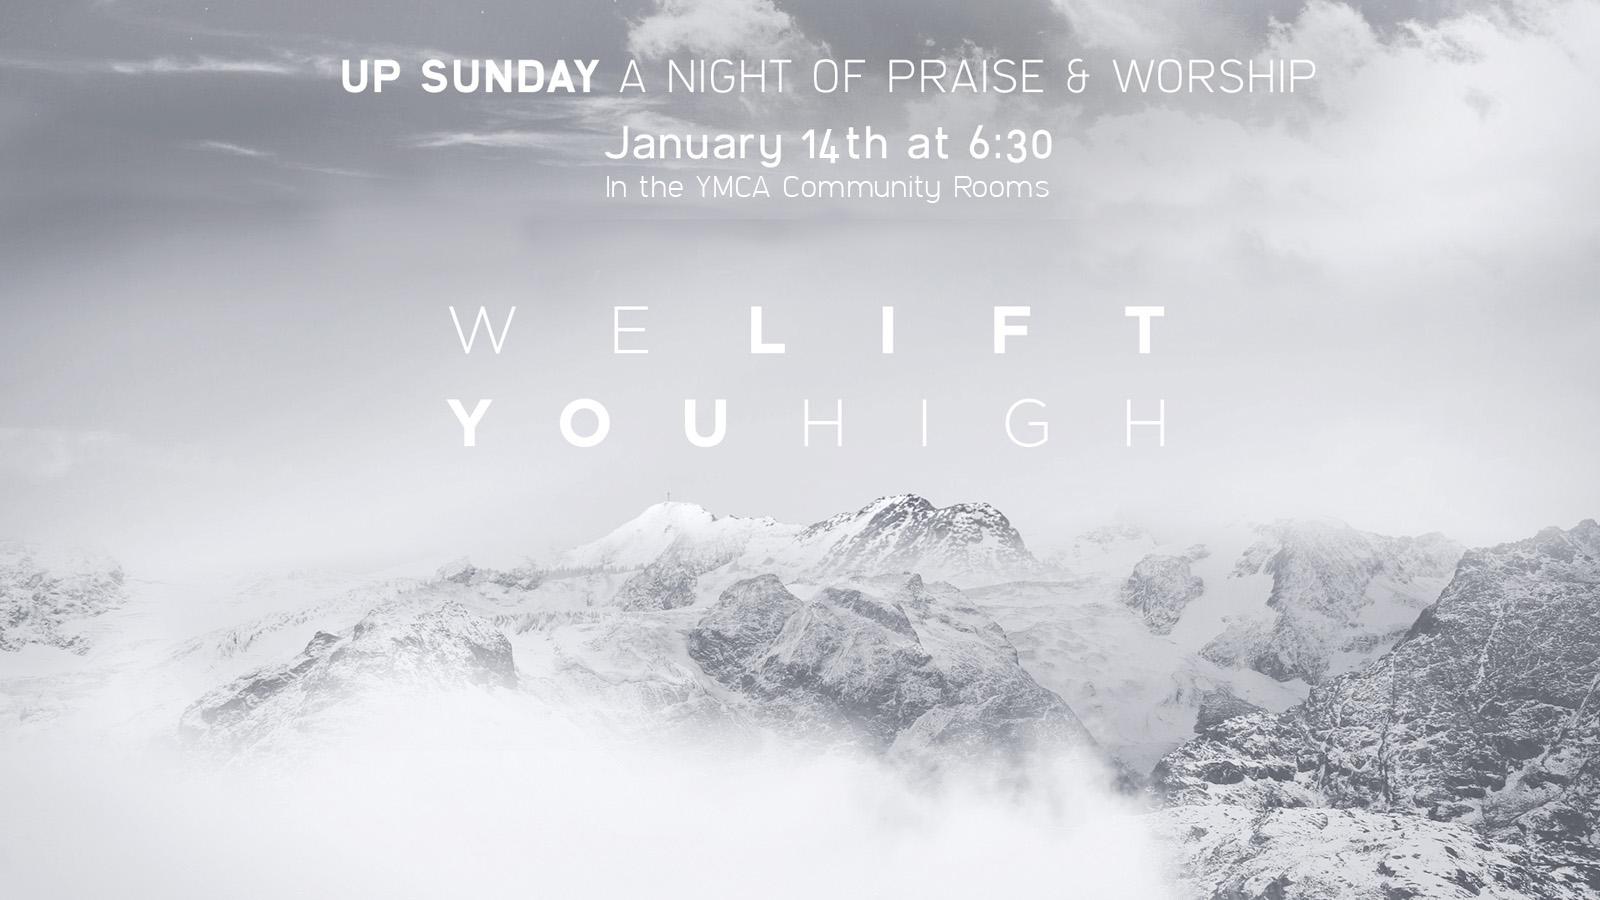 UP Sunday // A Night of Praise and Worship // Carl Johnson